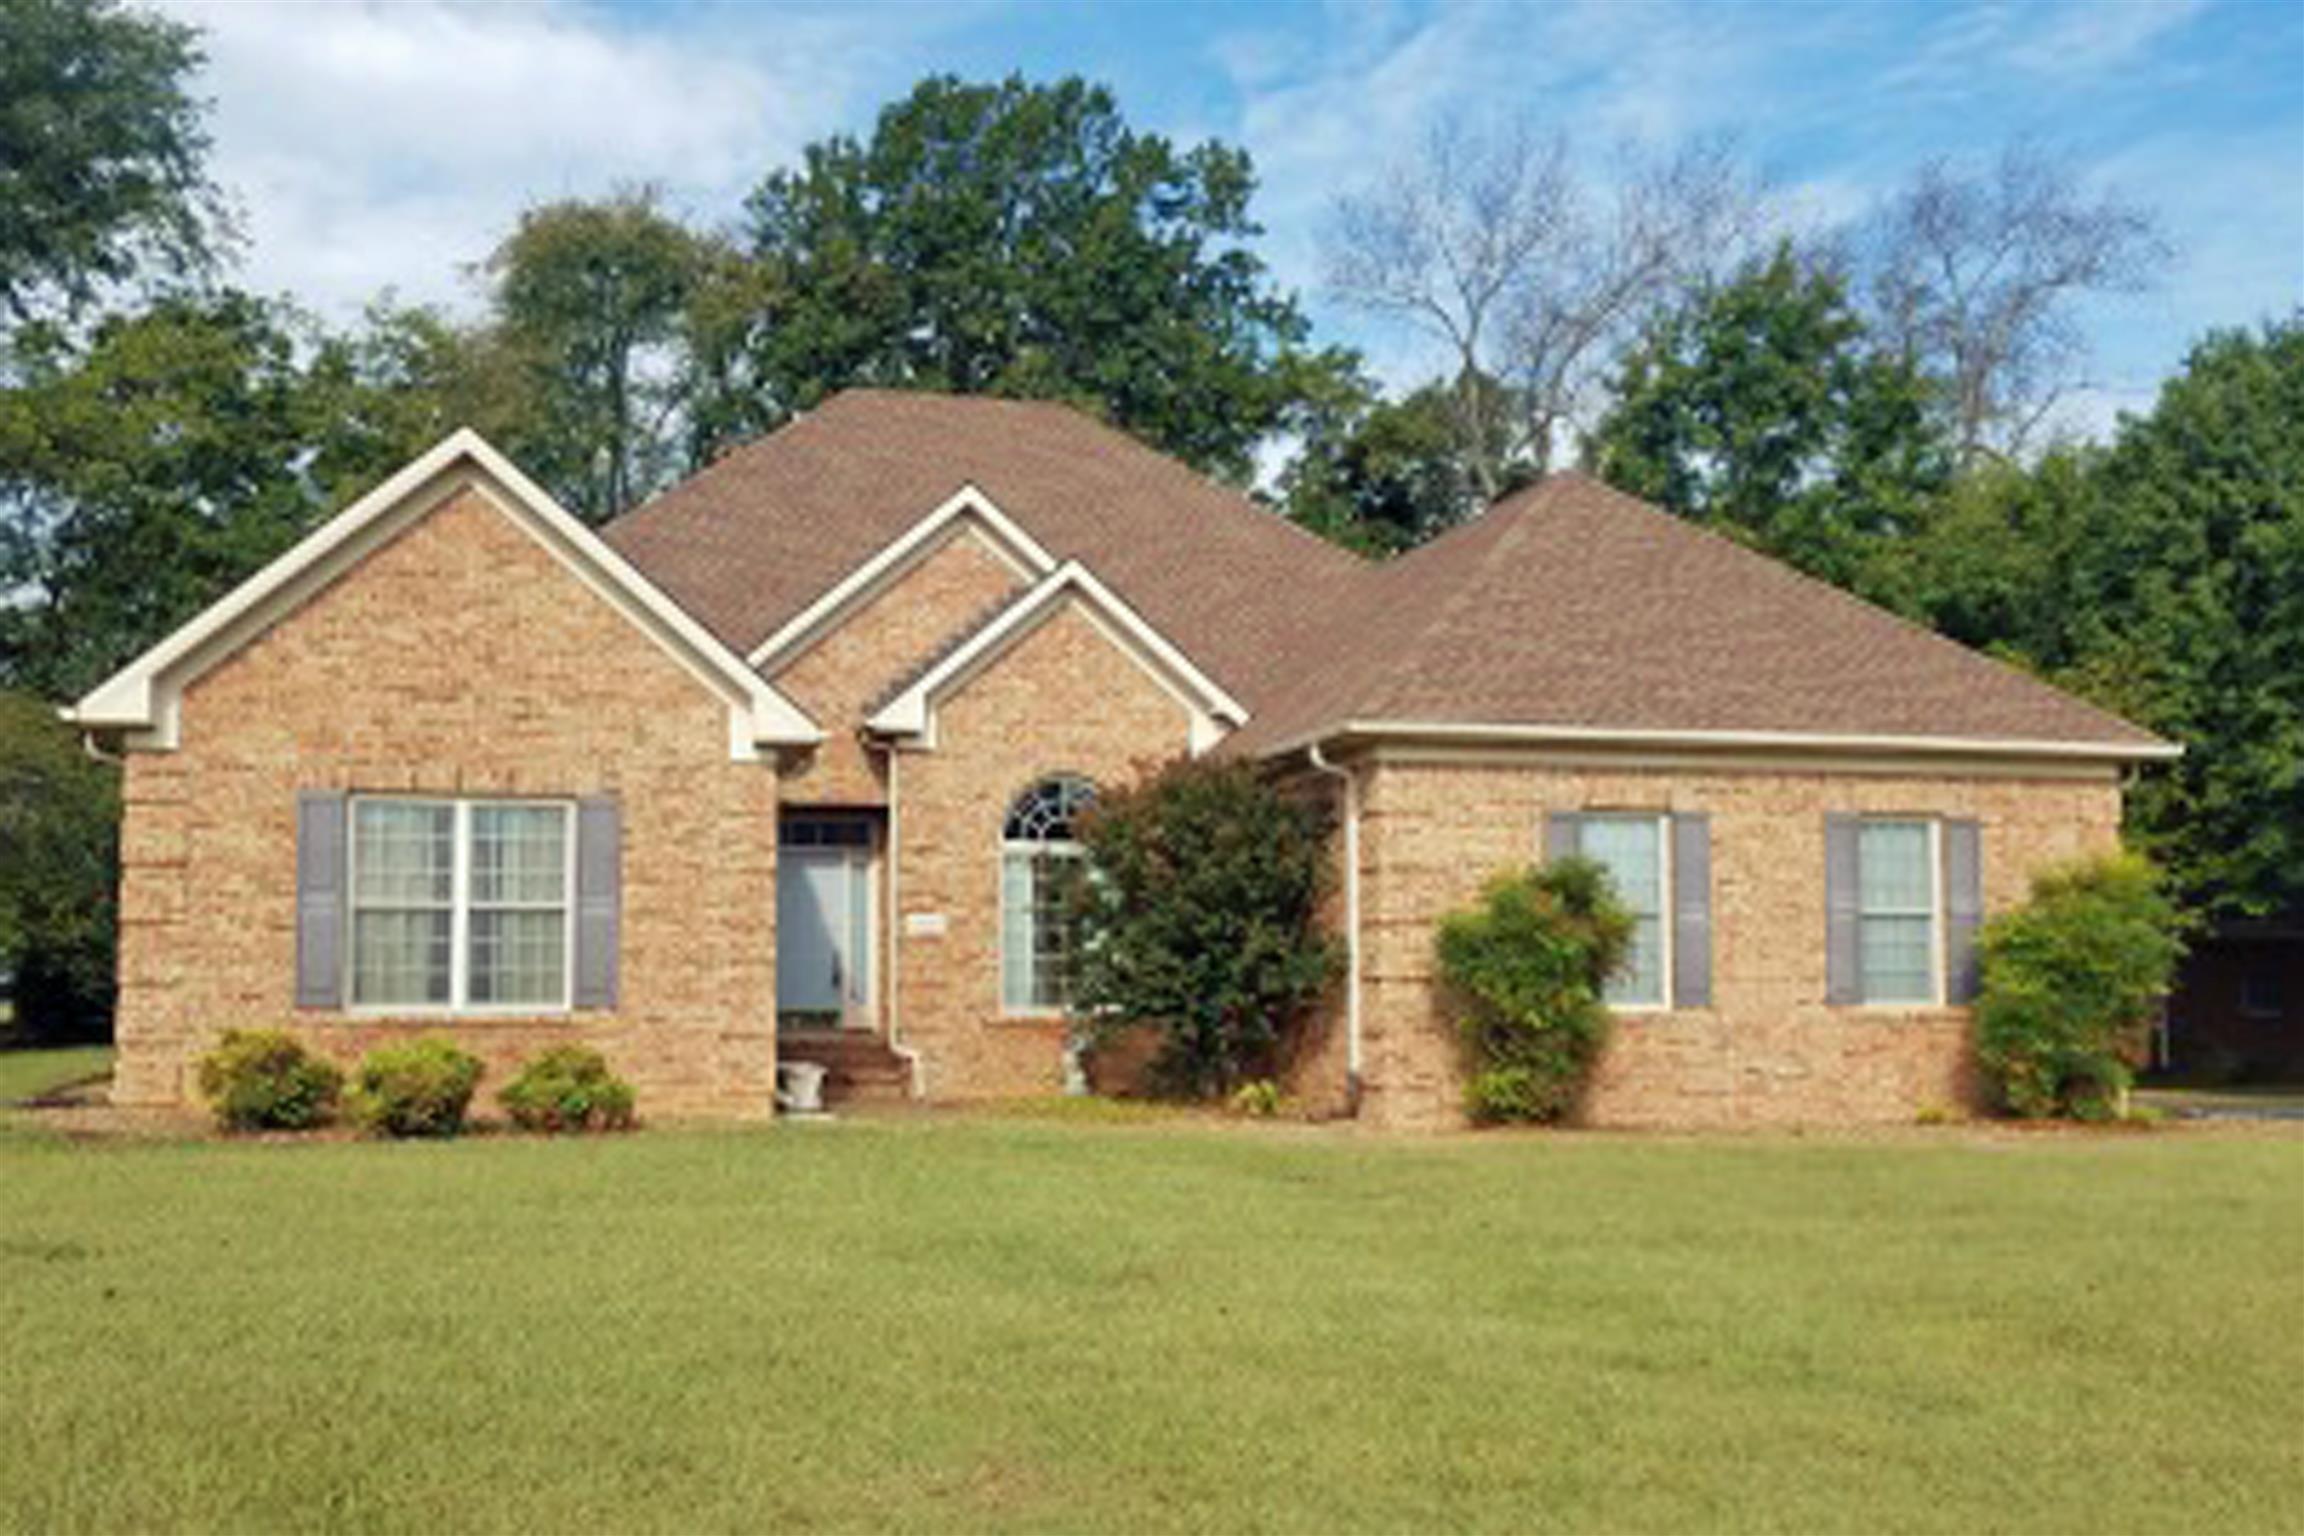 207 Wilson Way, Franklin, KY 42134 - Franklin, KY real estate listing